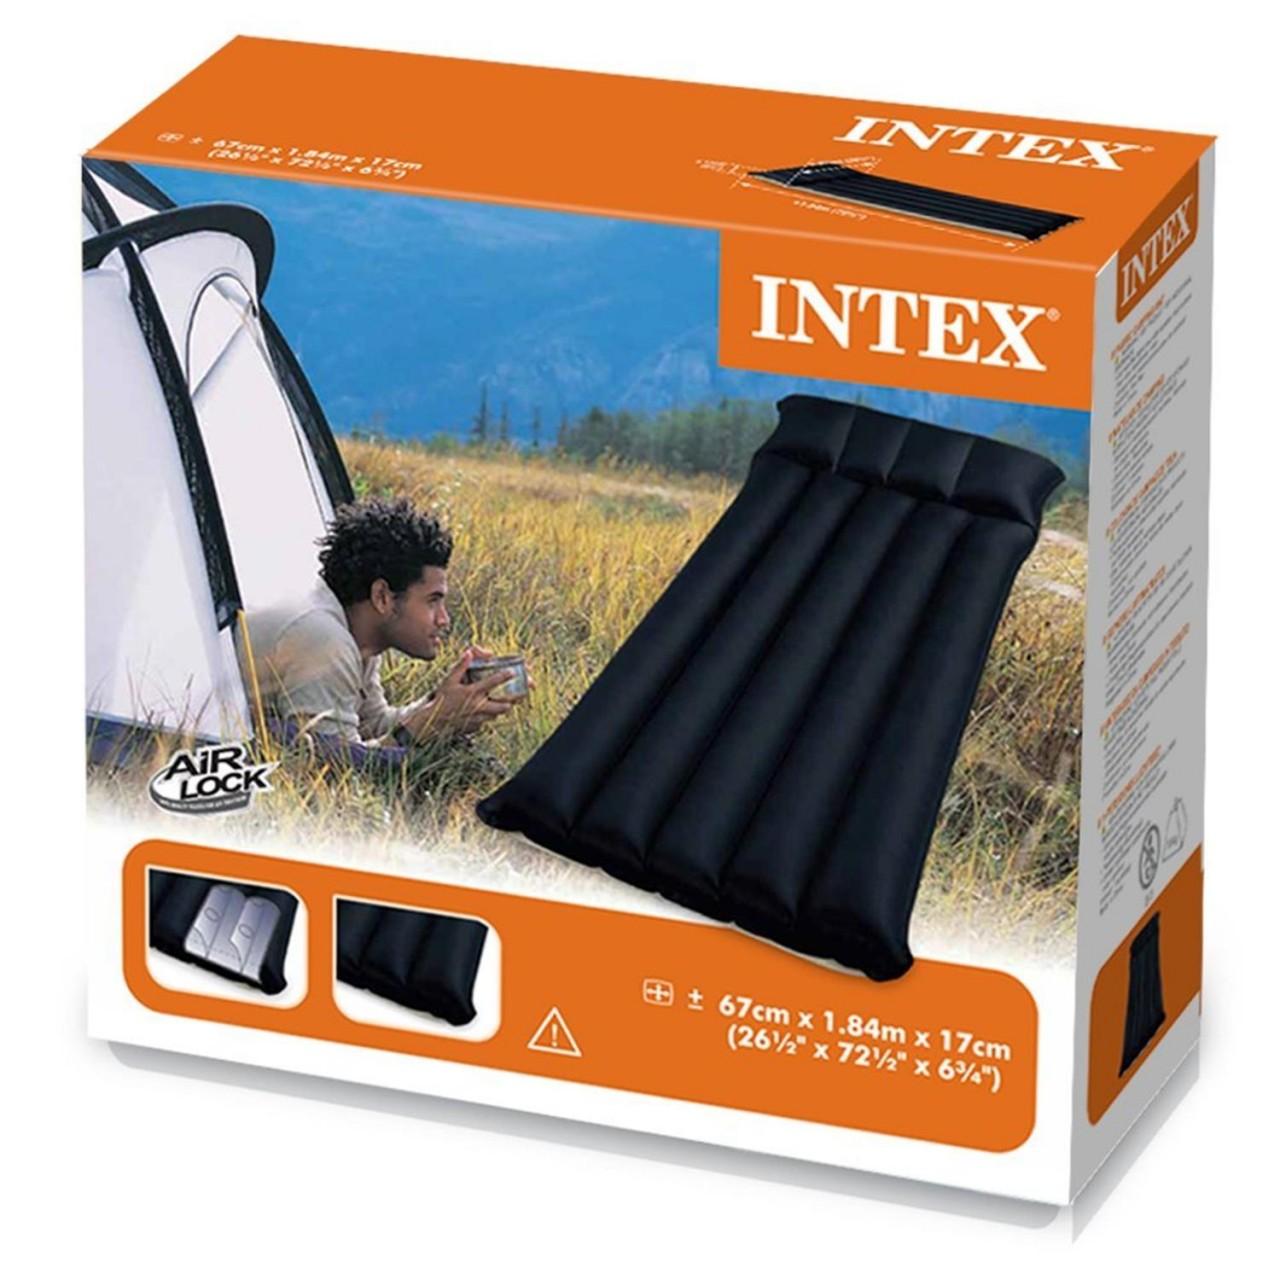 Intex Luftbett Matratze Camping Bett 184 x 67 x 17 cm